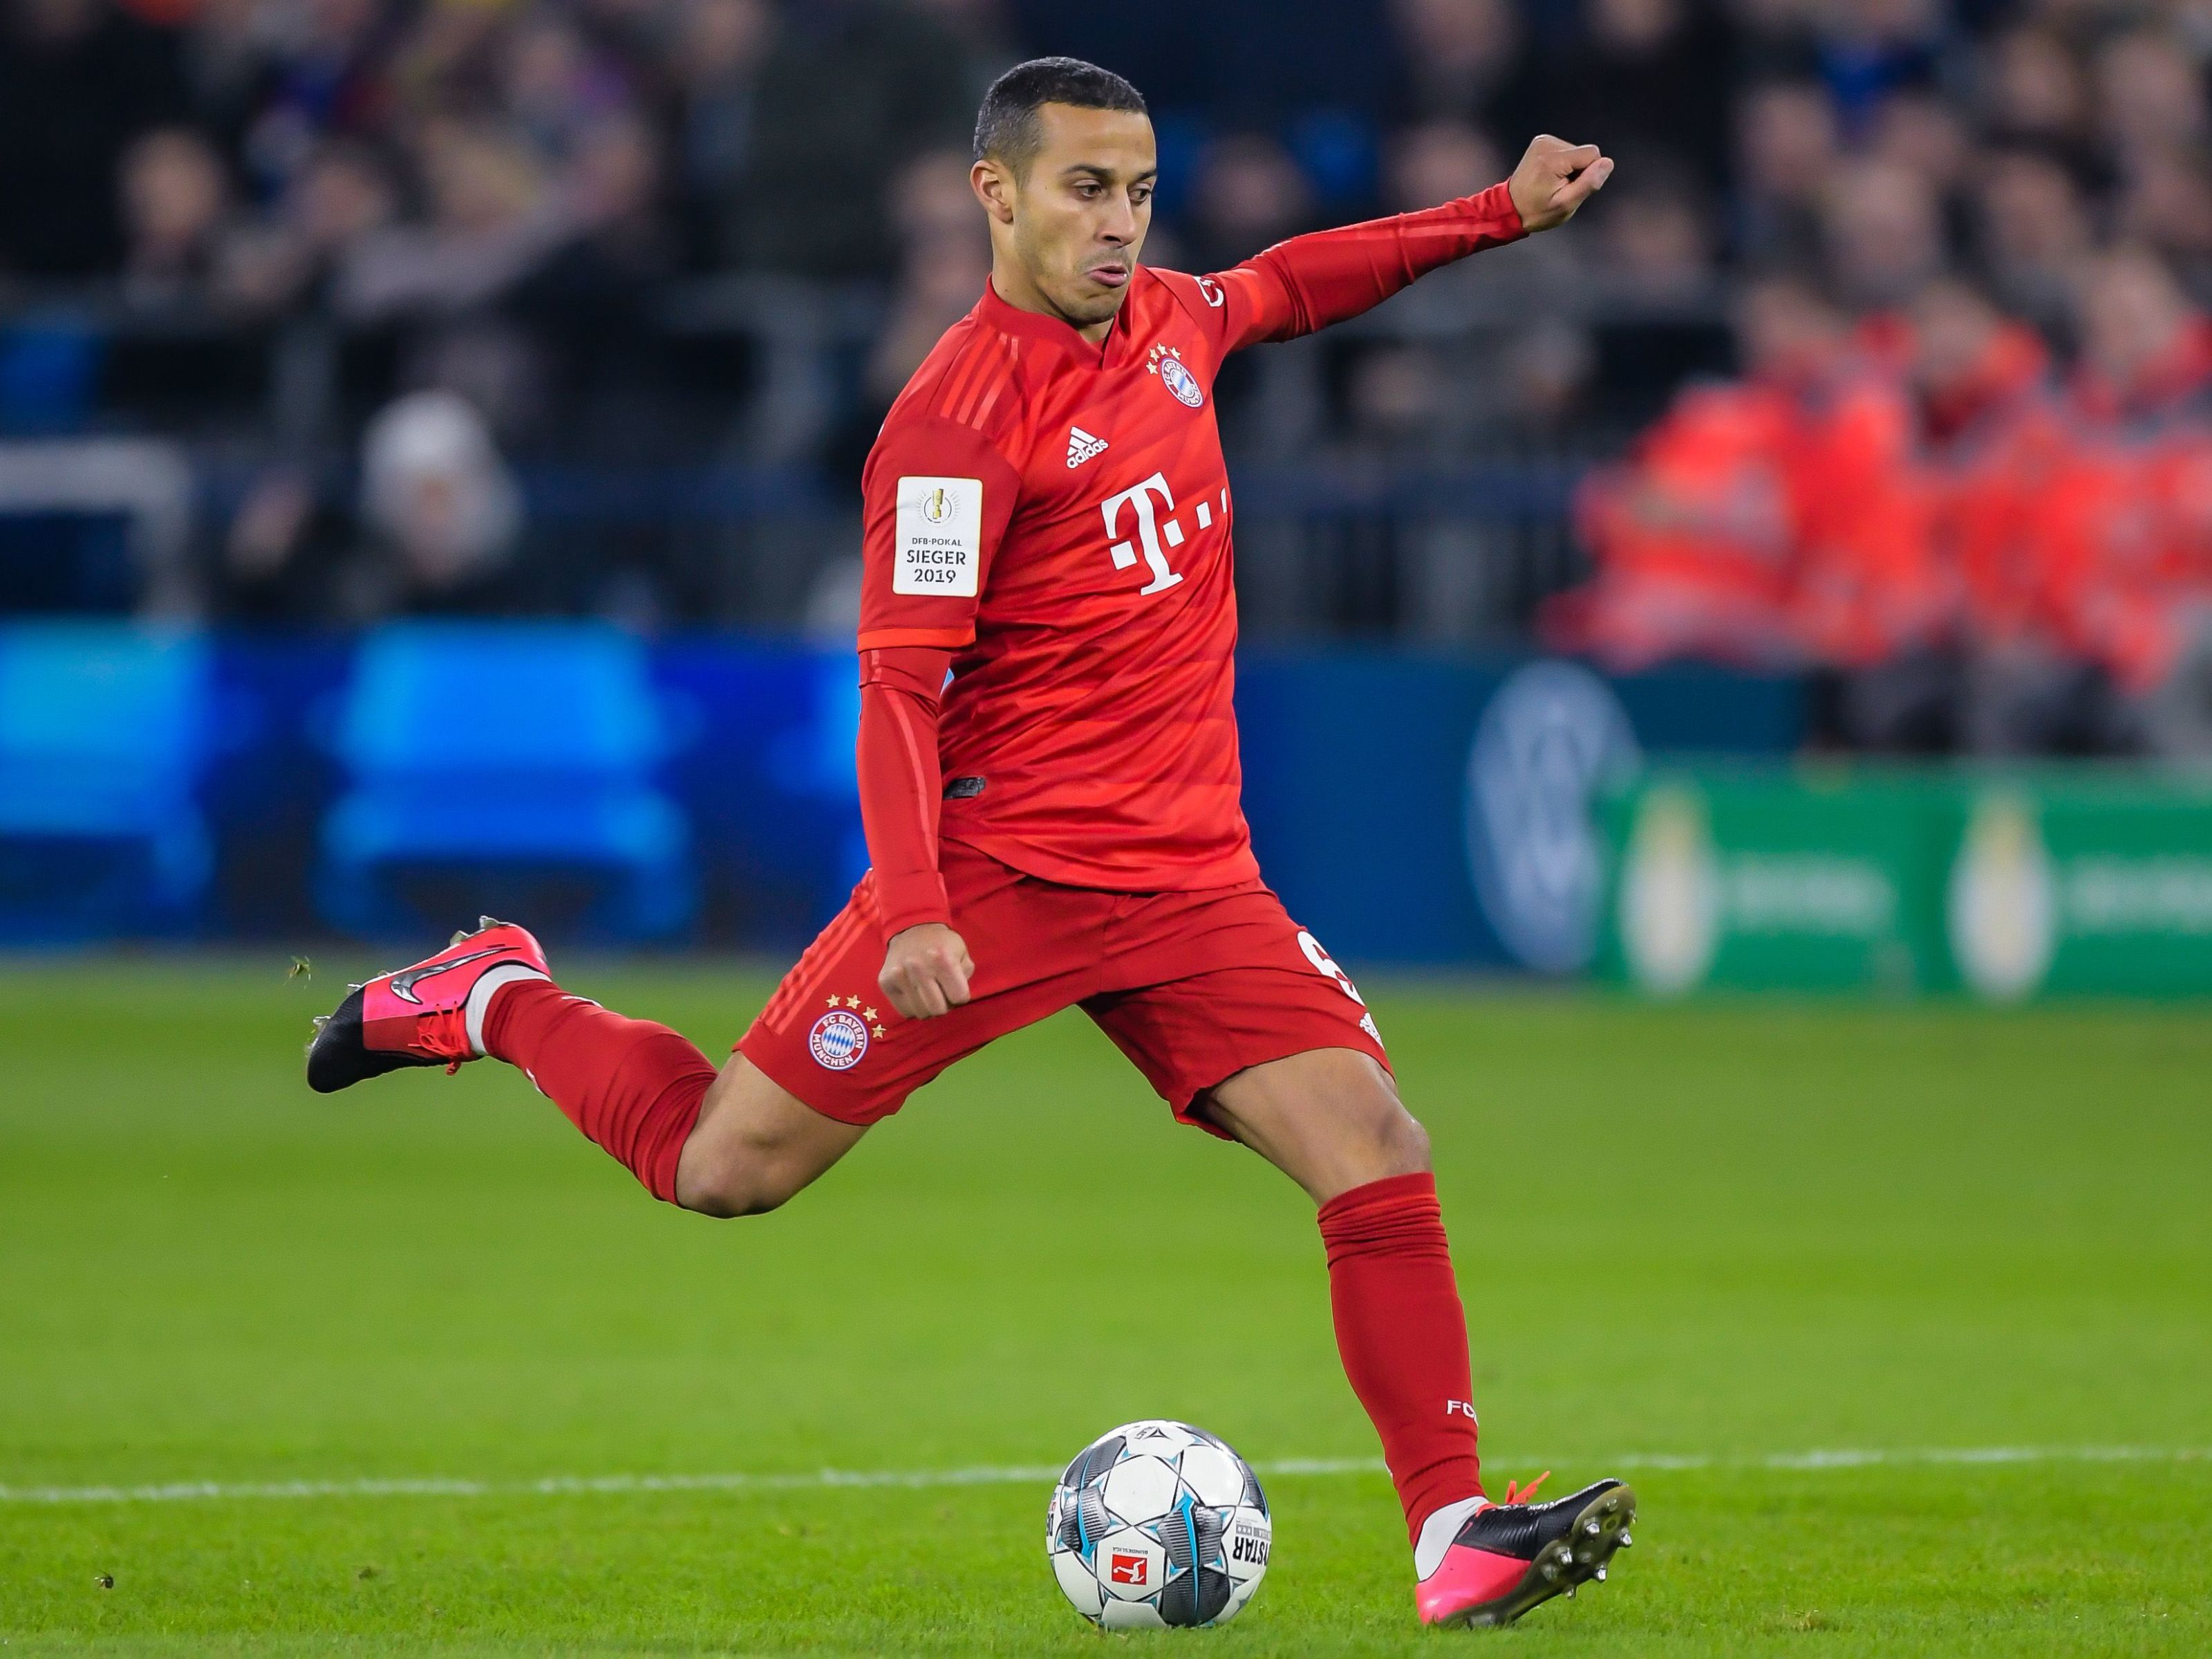 Bayern Munich midfielder Thiago Alcantara agrees terms with Liverpool